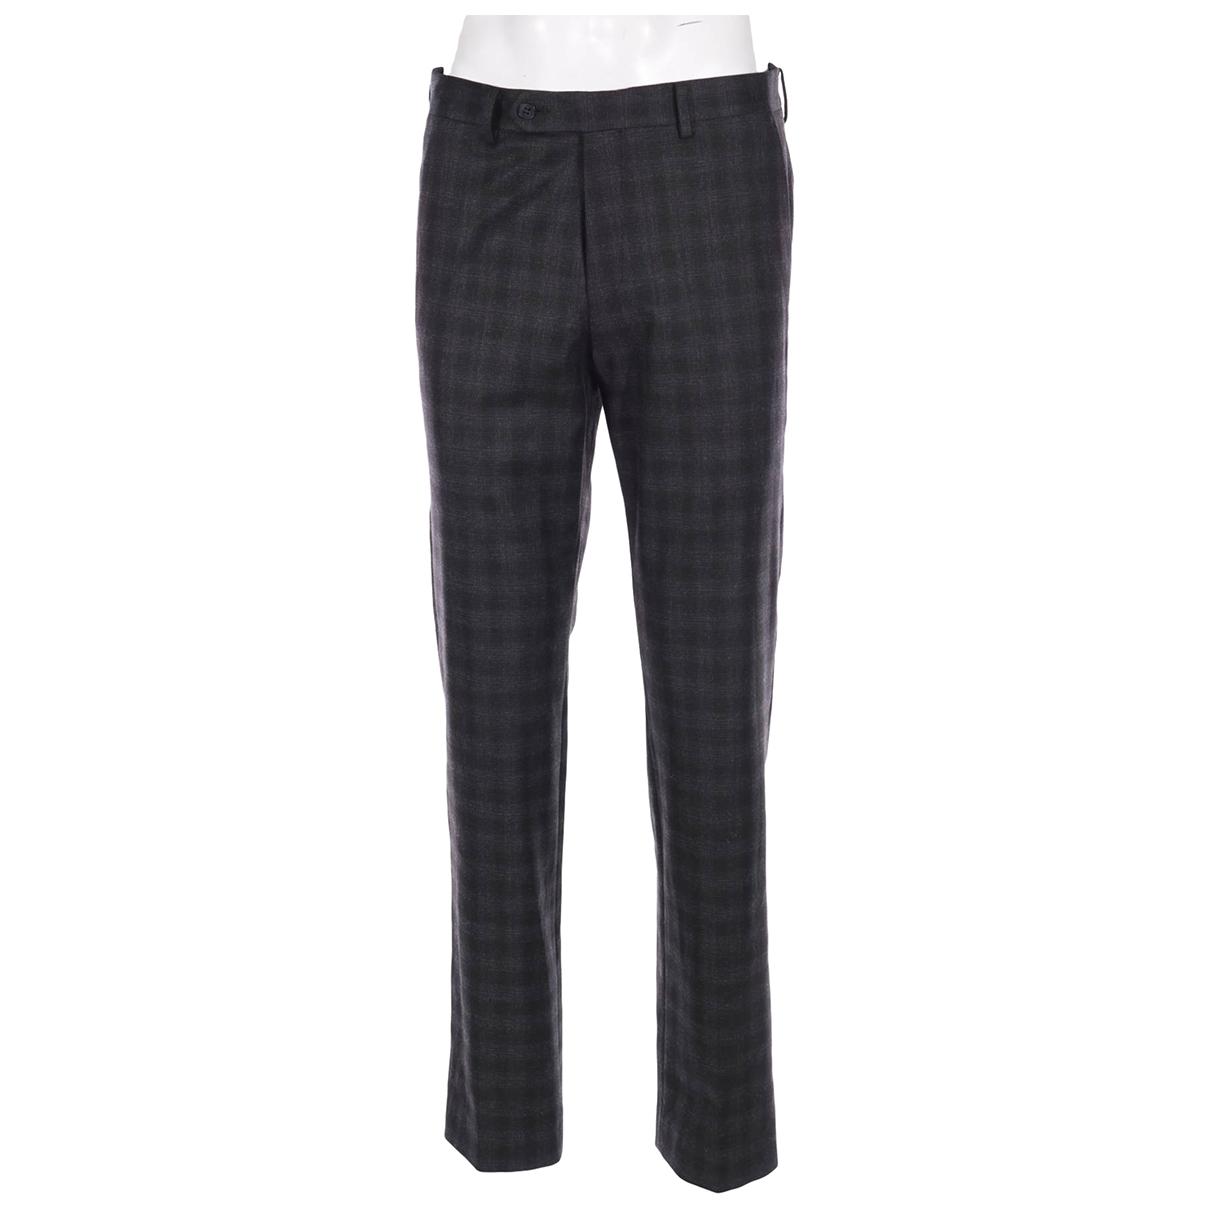 John Varvatos \N Multicolour Trousers for Men 32 UK - US